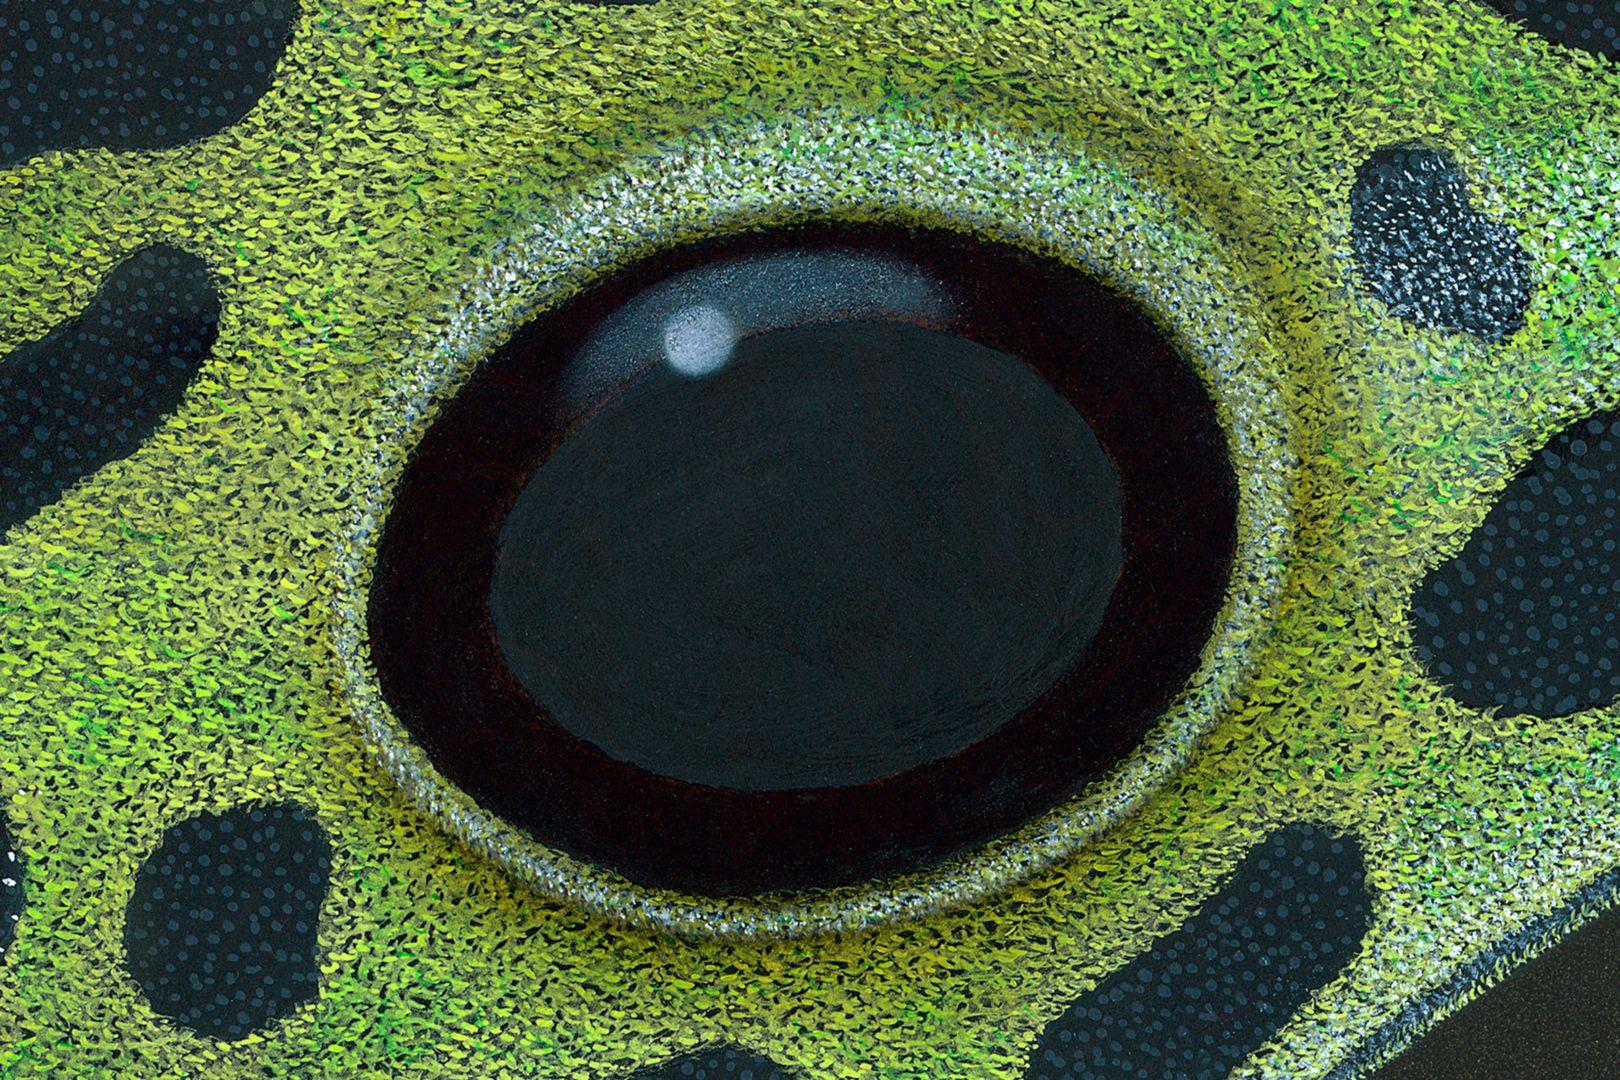 Poison dart frog Eye